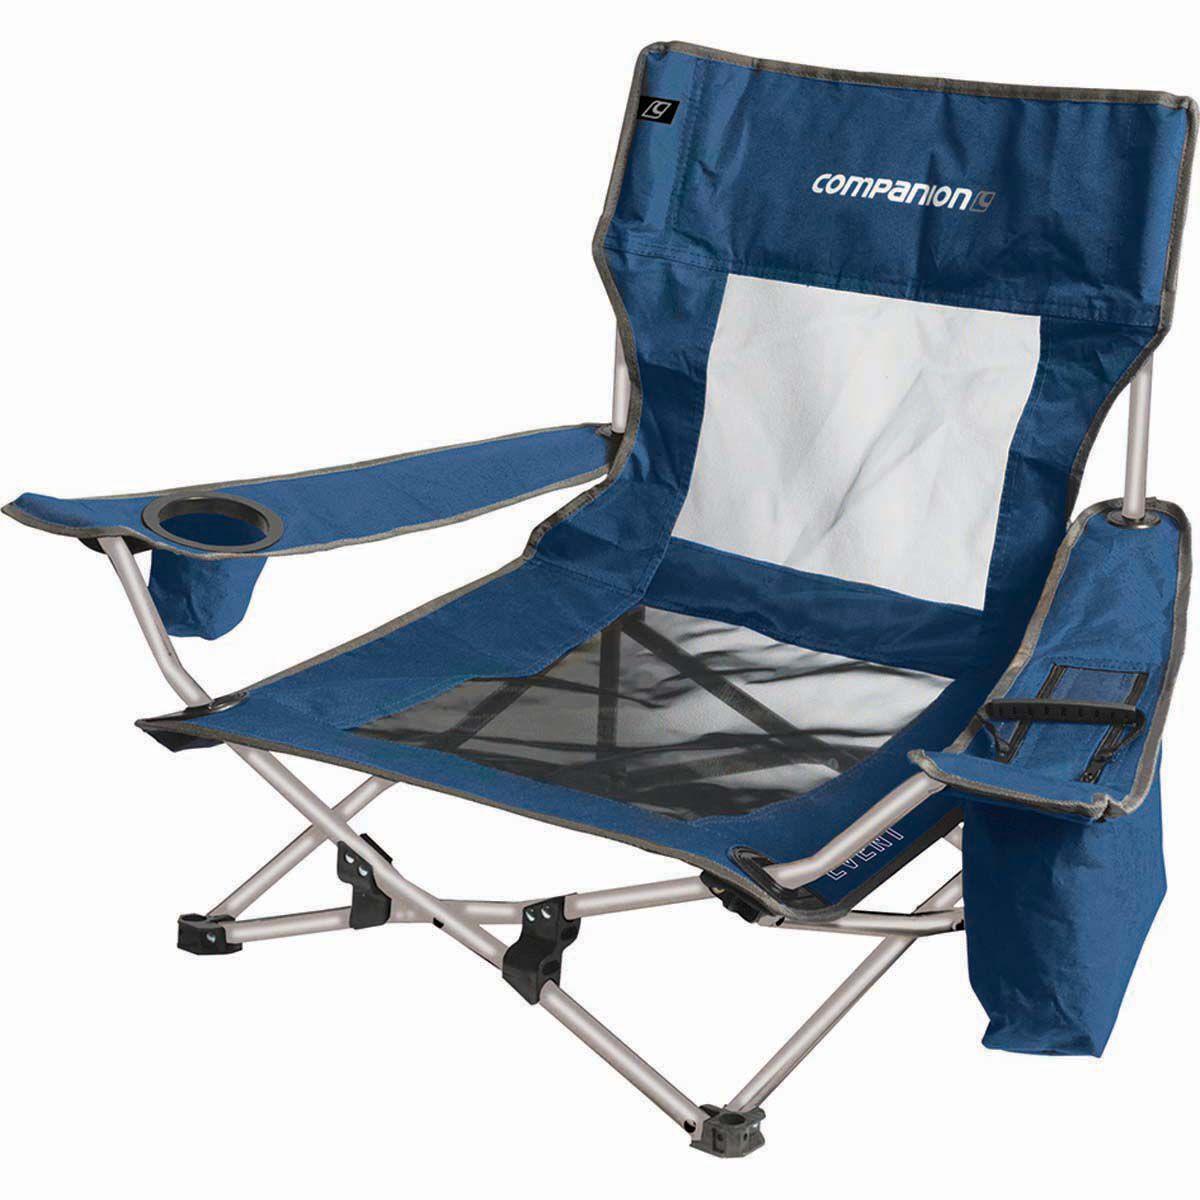 Companion Event Camp Chair  BCF